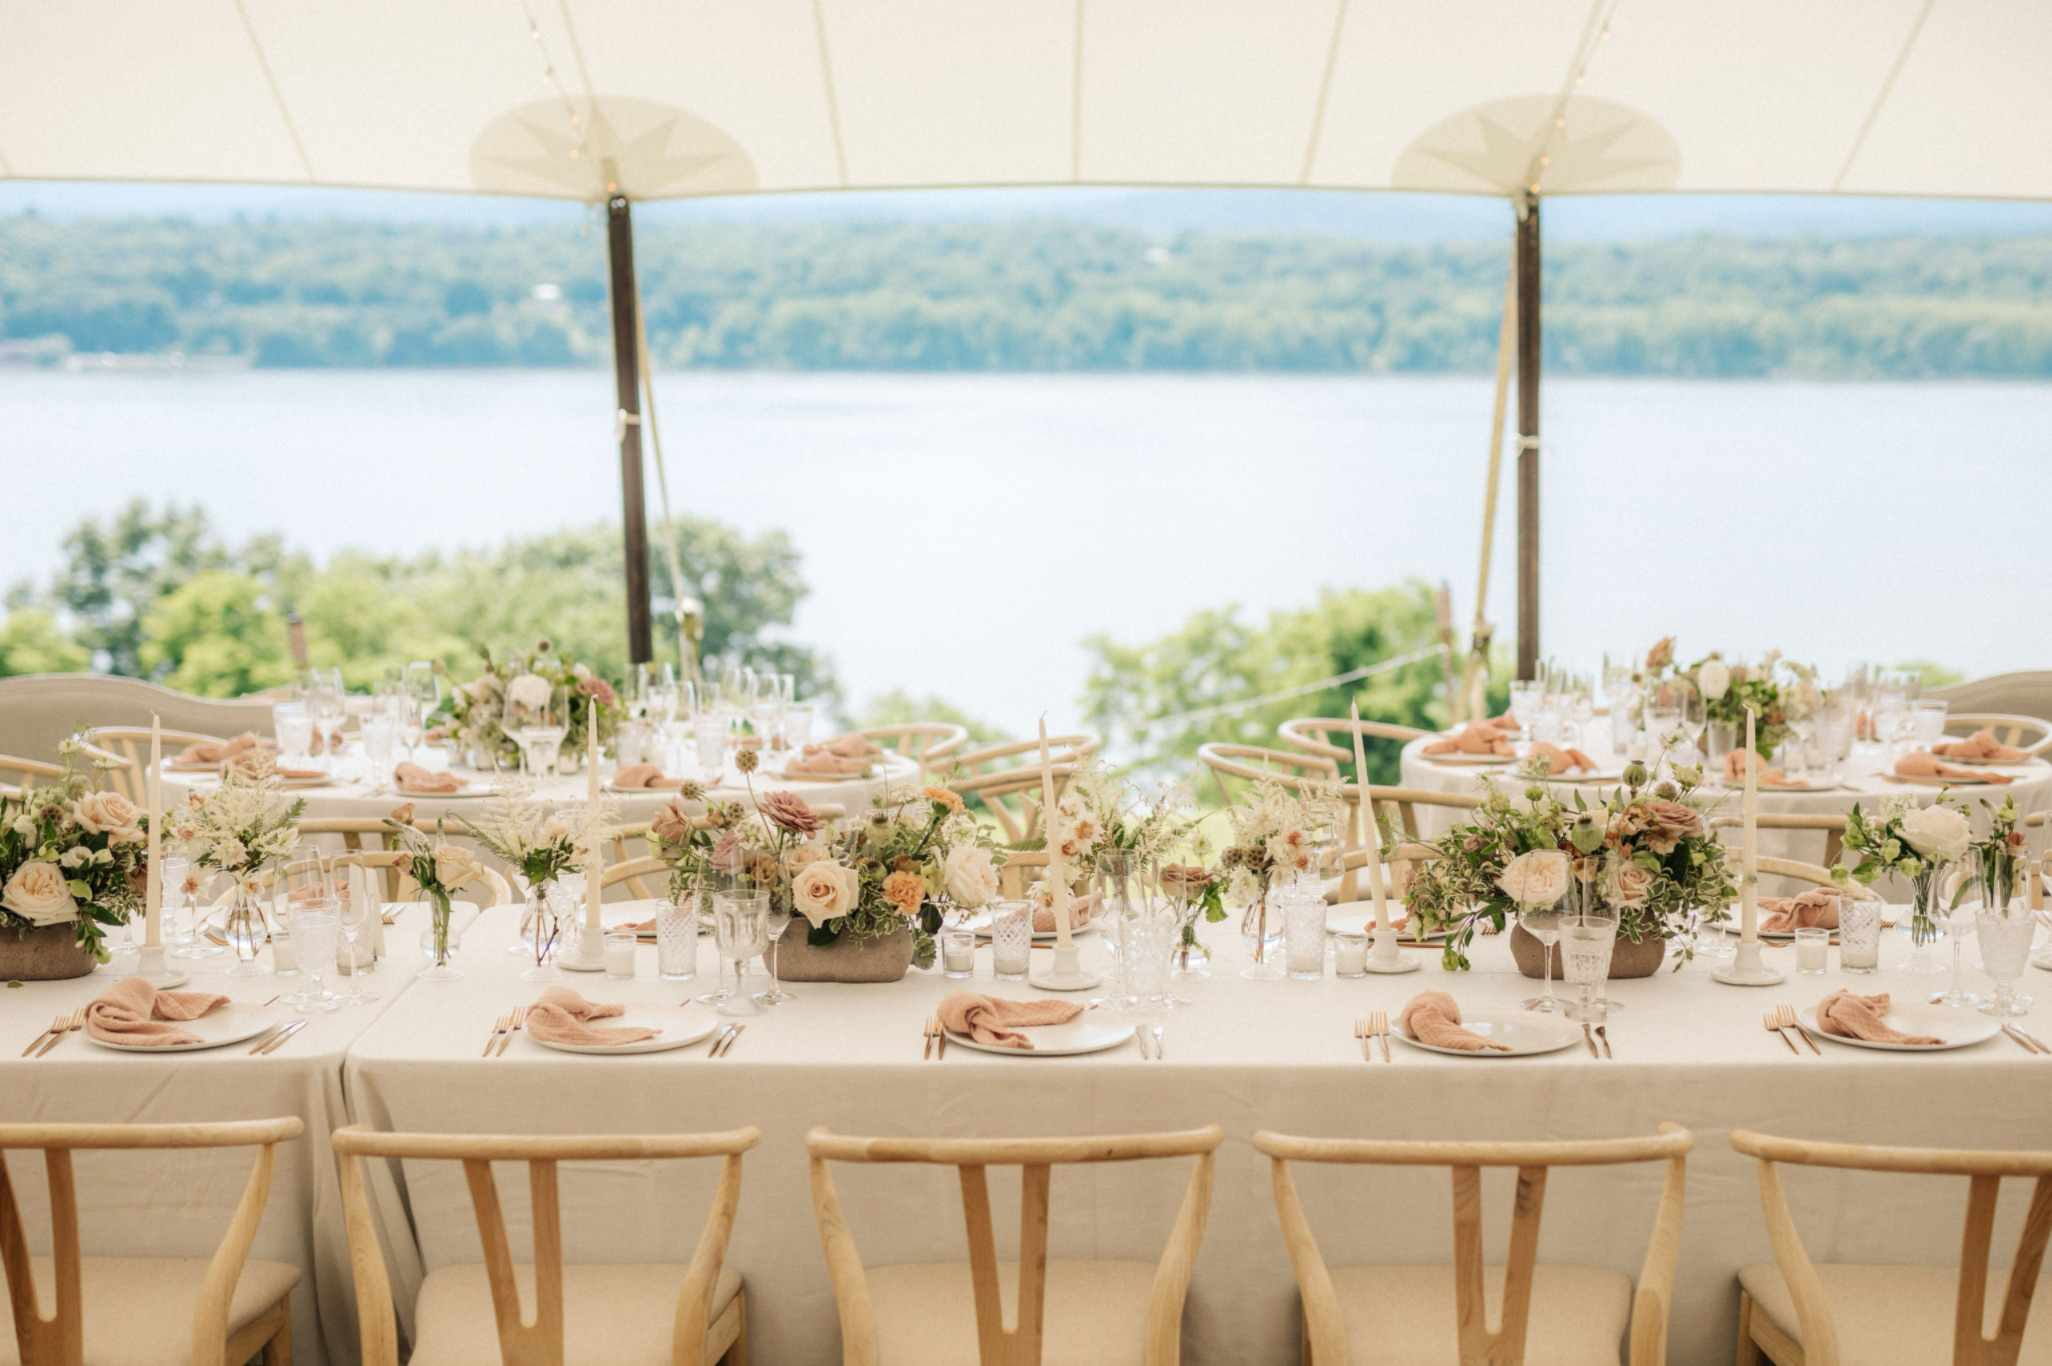 Blush reception theme overlooking lake